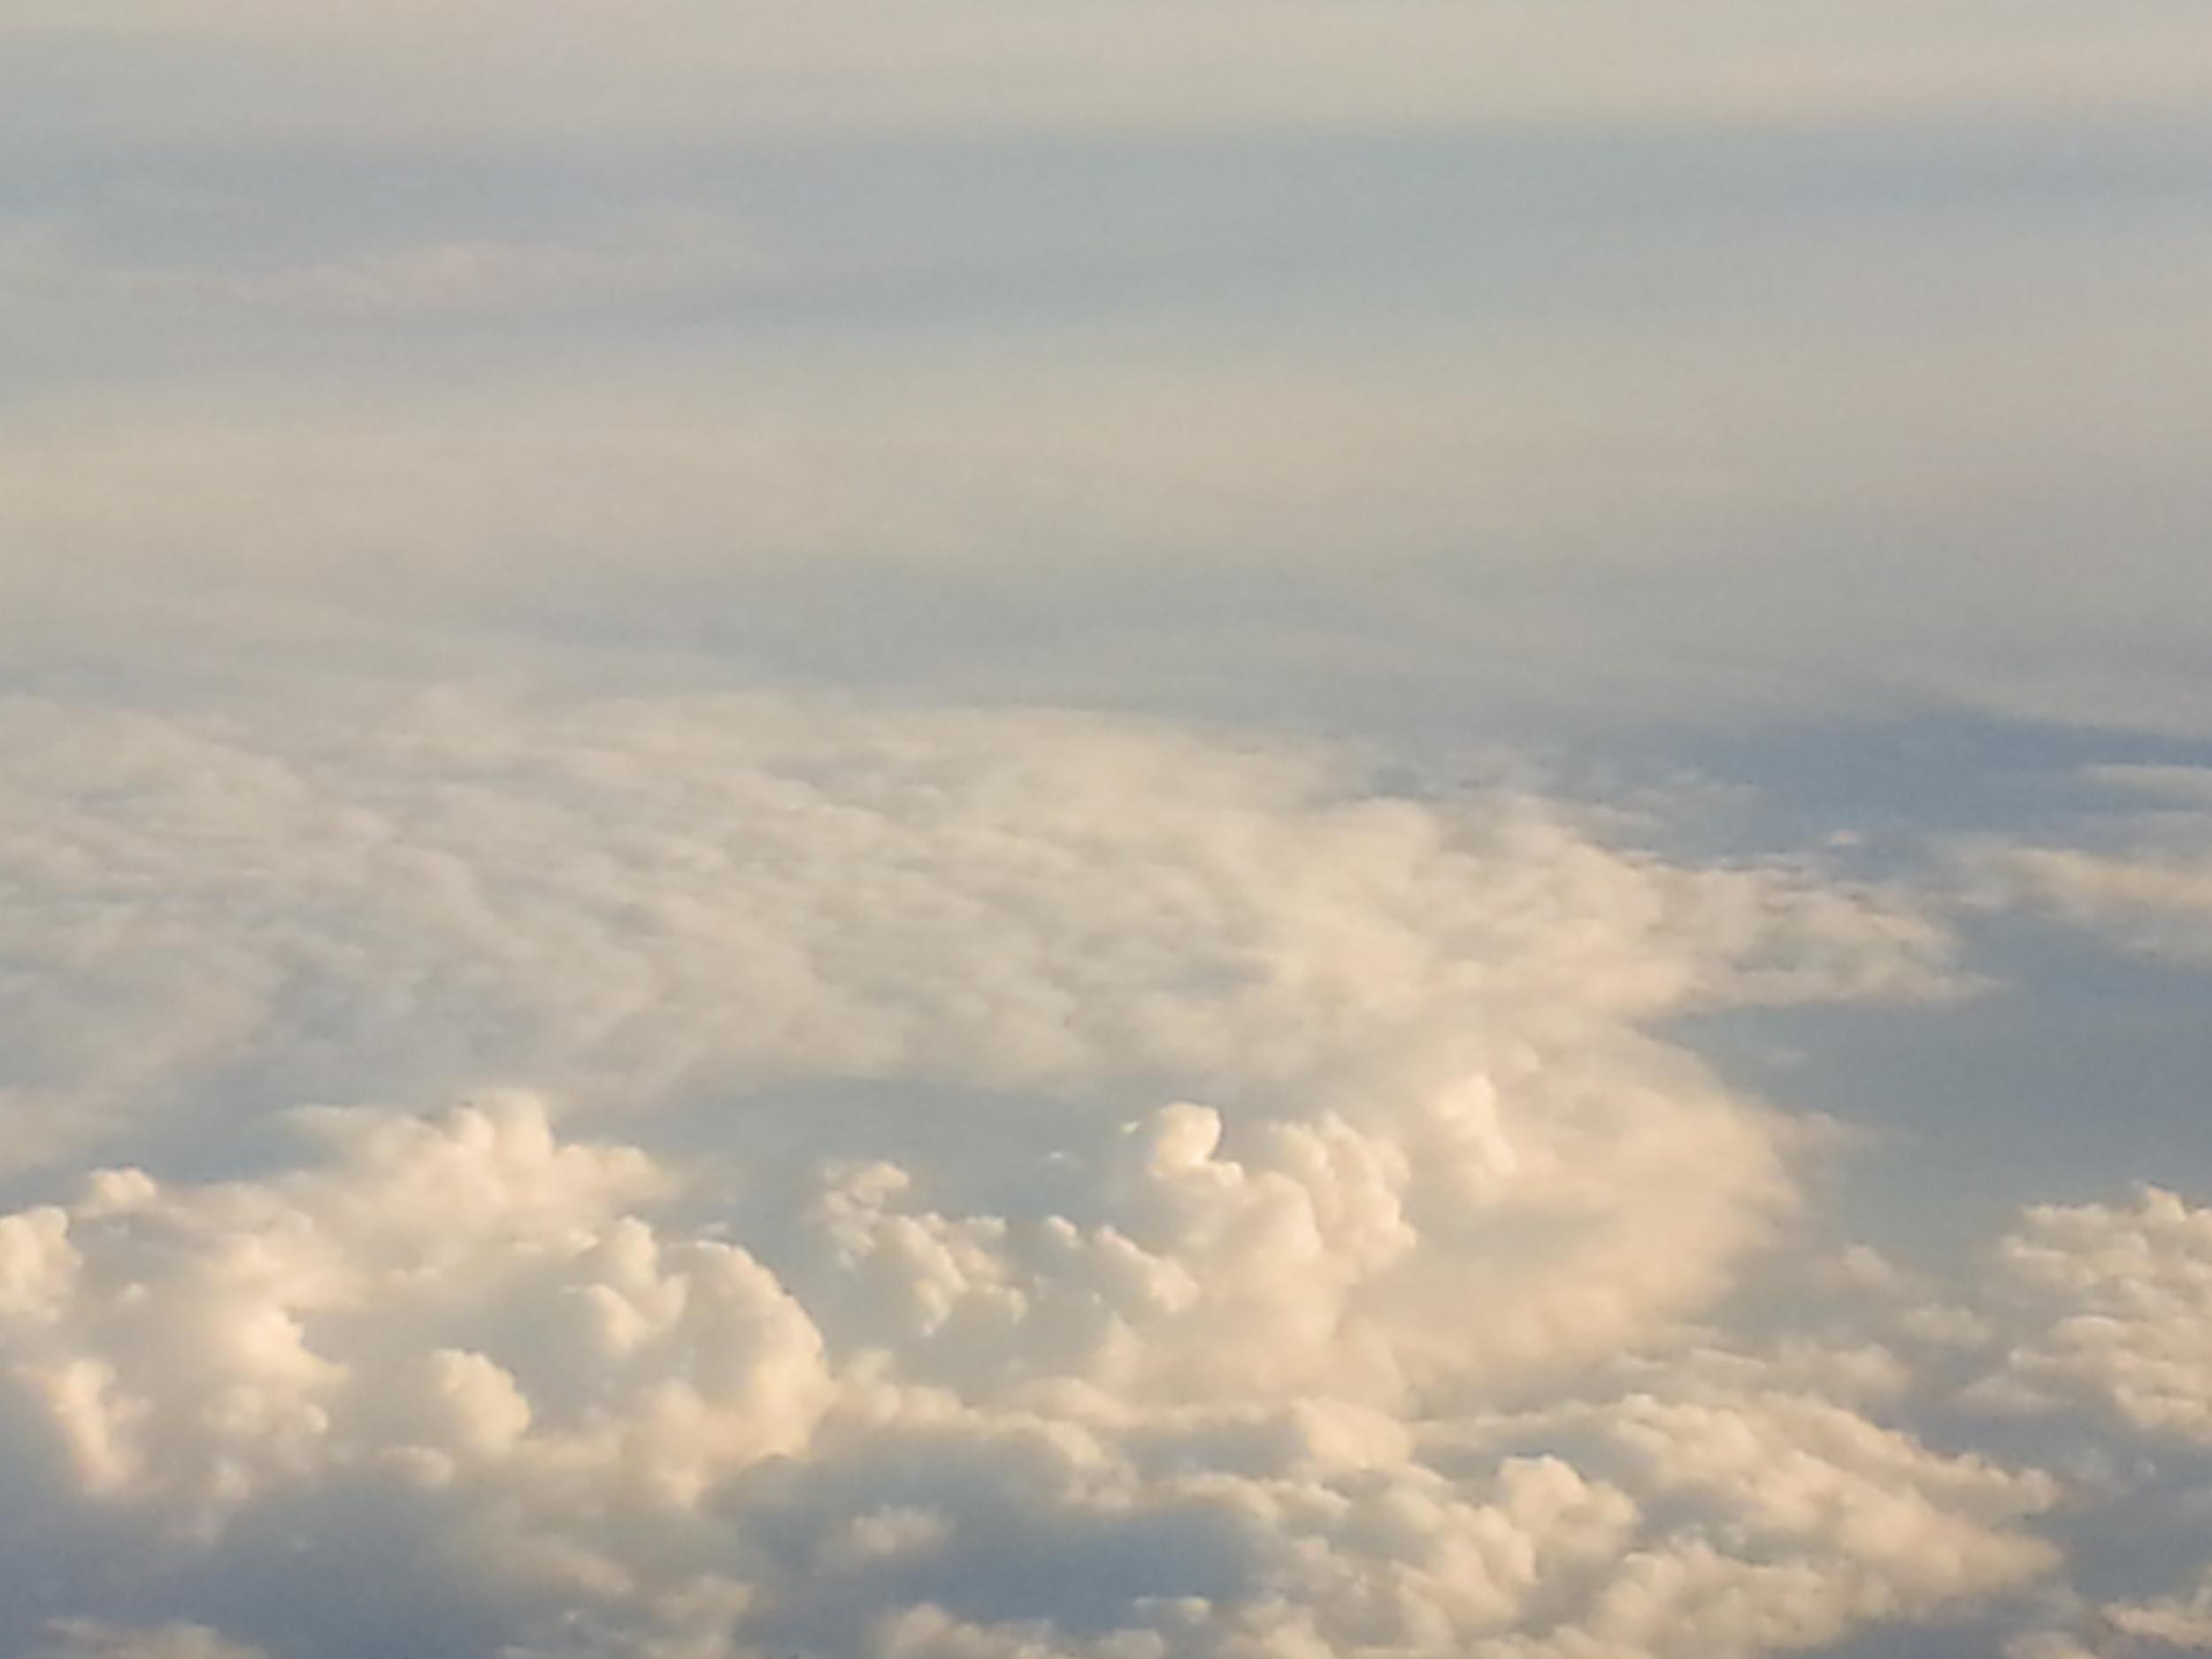 Glowing clouds above the Atlantic ocean